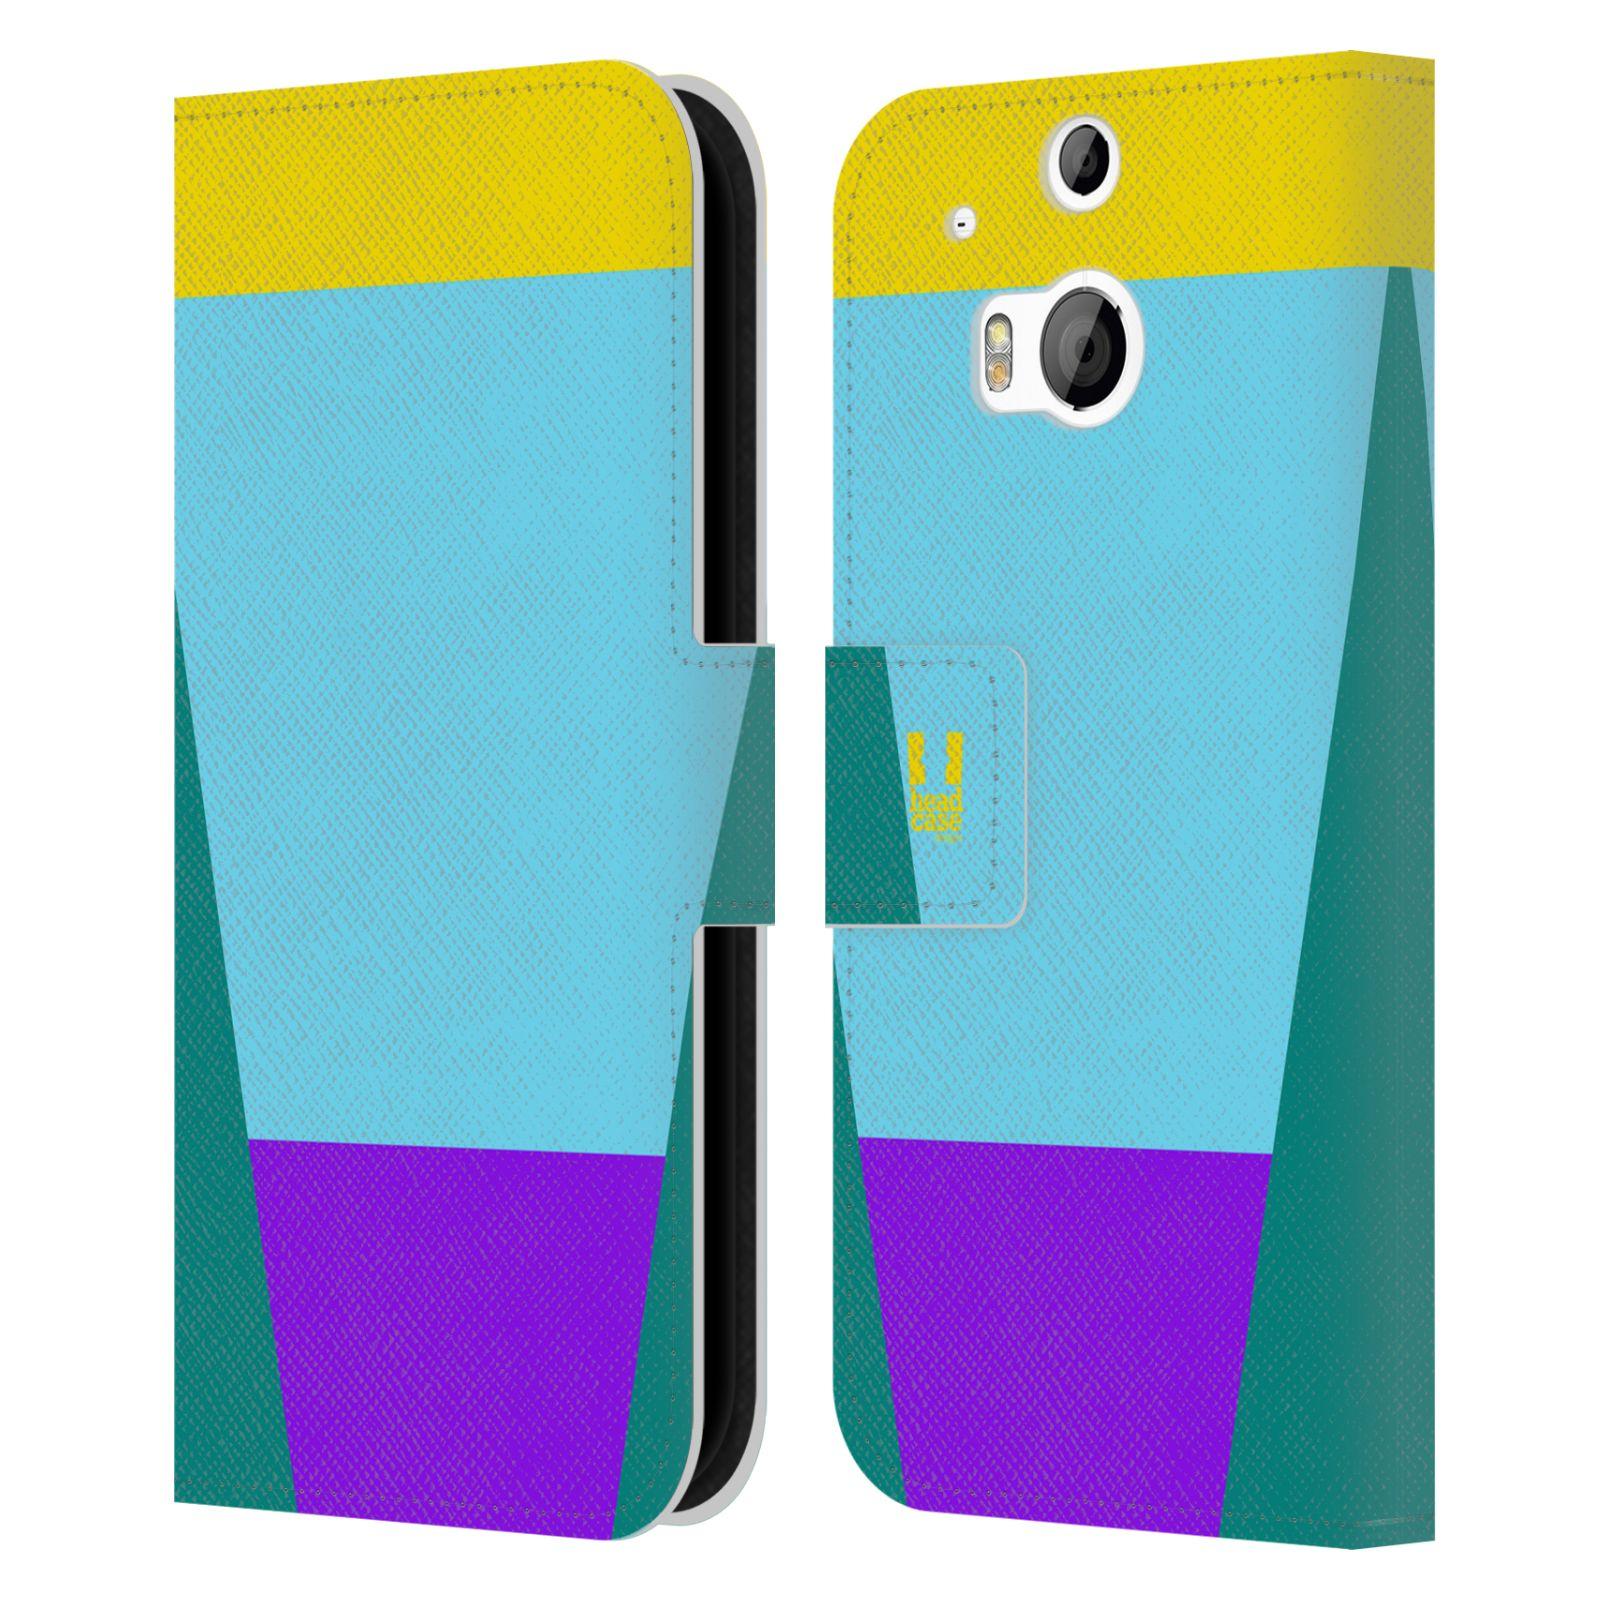 HEAD CASE Flipové pouzdro pro mobil HTC ONE M8/M8s barevné tvary nebesky modrá